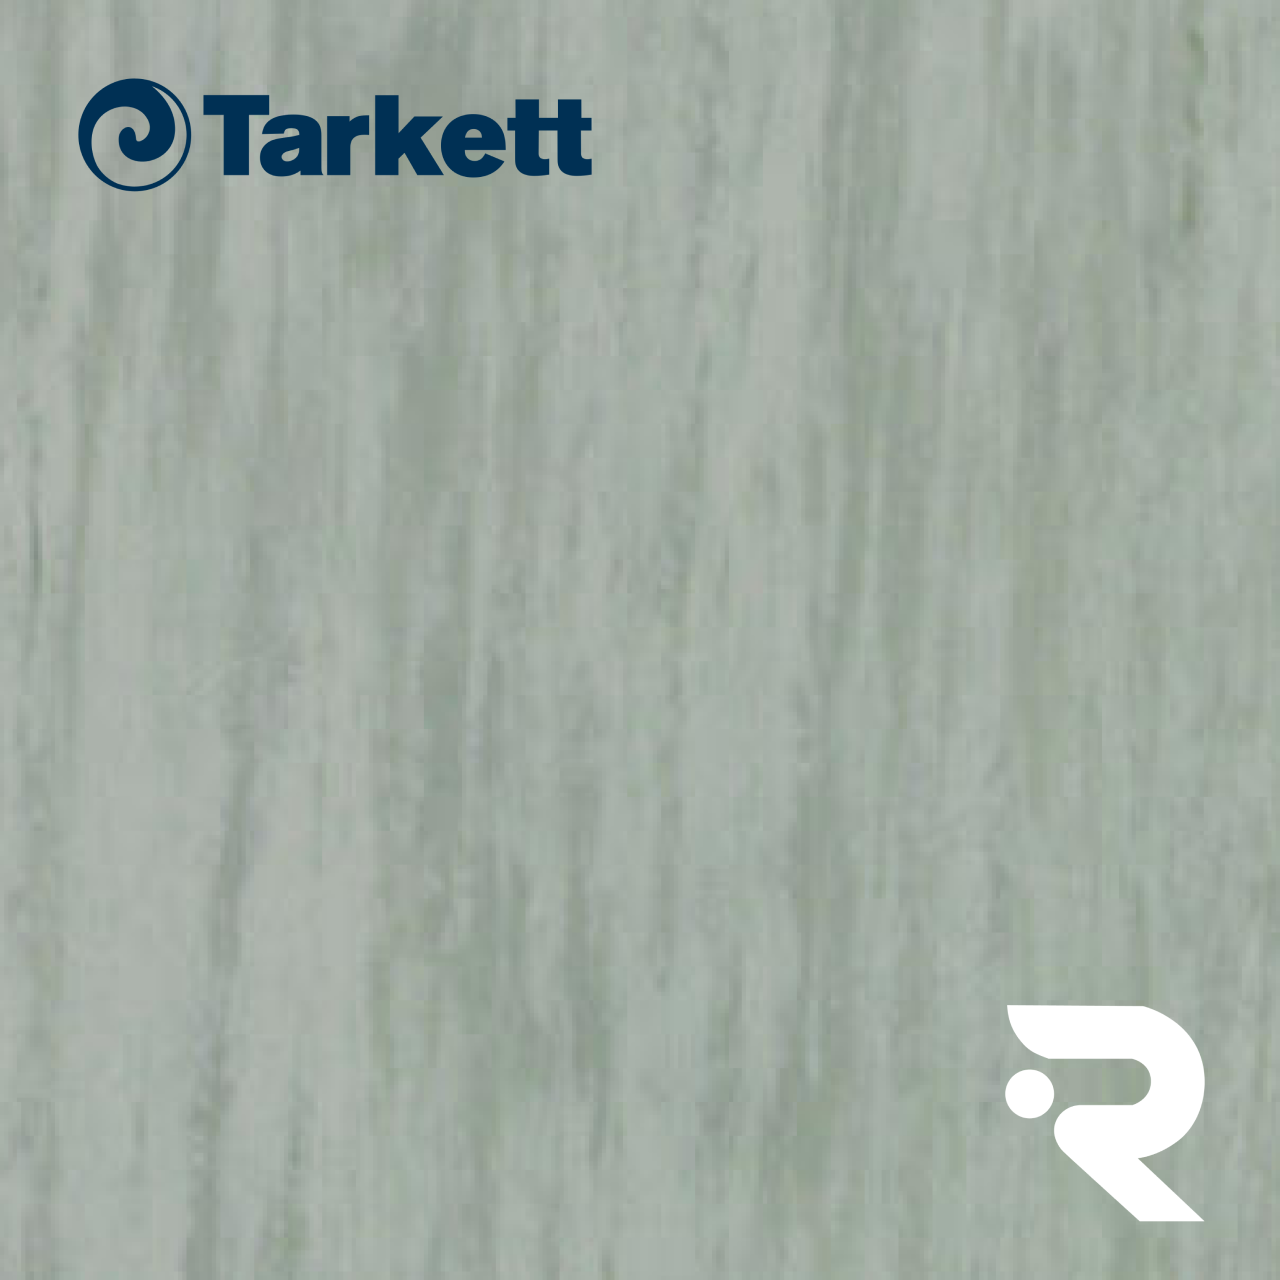 🏫 Гомогенный линолеум Tarkett | Standard PALE GREEN 0923 | Standard Plus 2.0 mm | 2 х 23 м